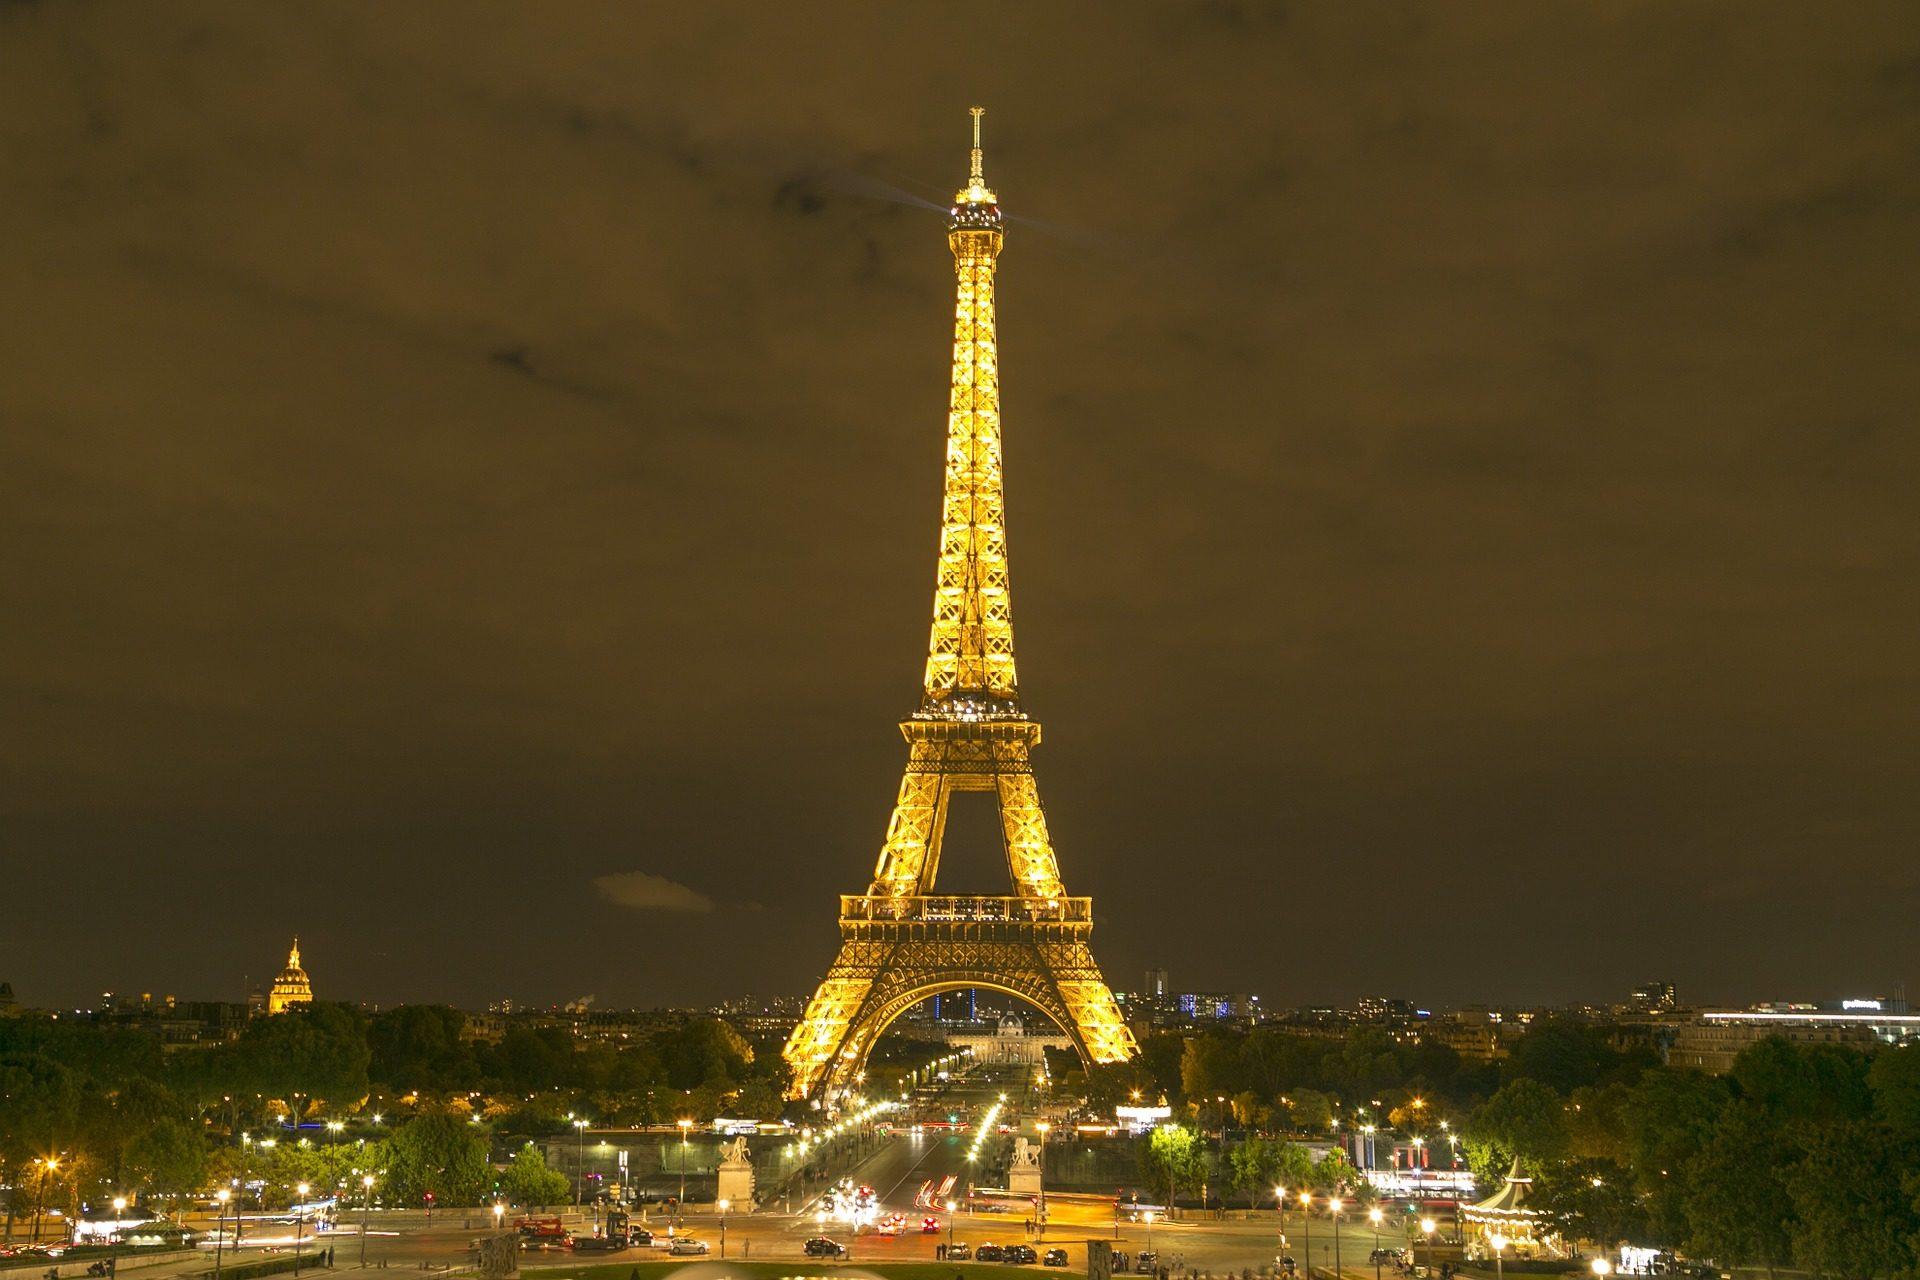 टॉवर, एफिल, शहर, रात, रोशनी, स्मारक, पेरिस - HD वॉलपेपर - प्रोफेसर-falken.com